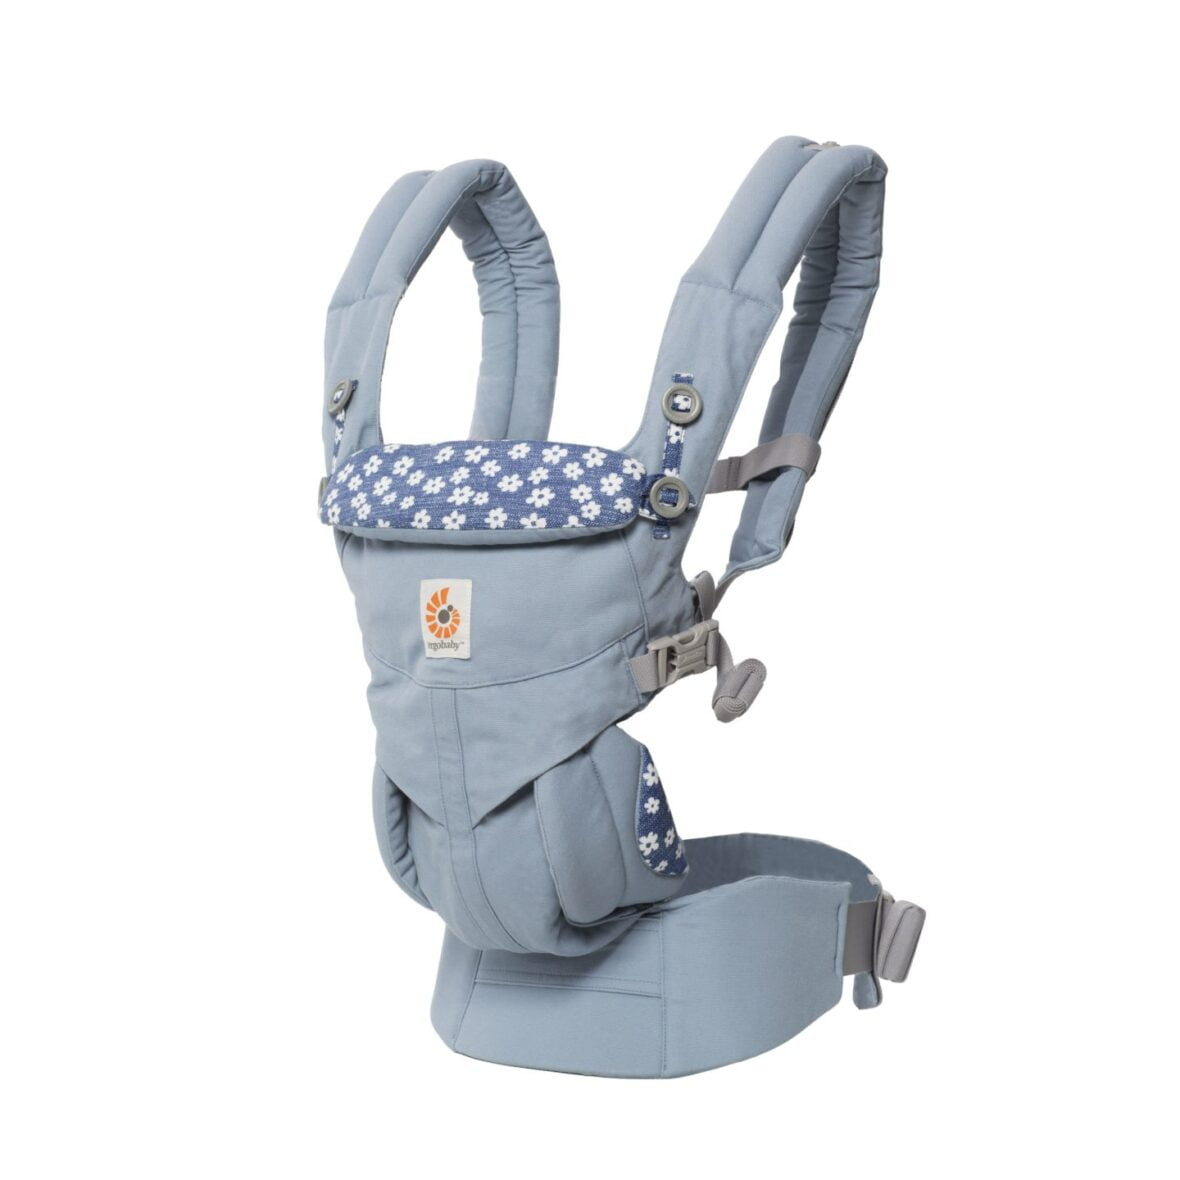 Ergobaby nosiljka Omni360 Blue Daisies